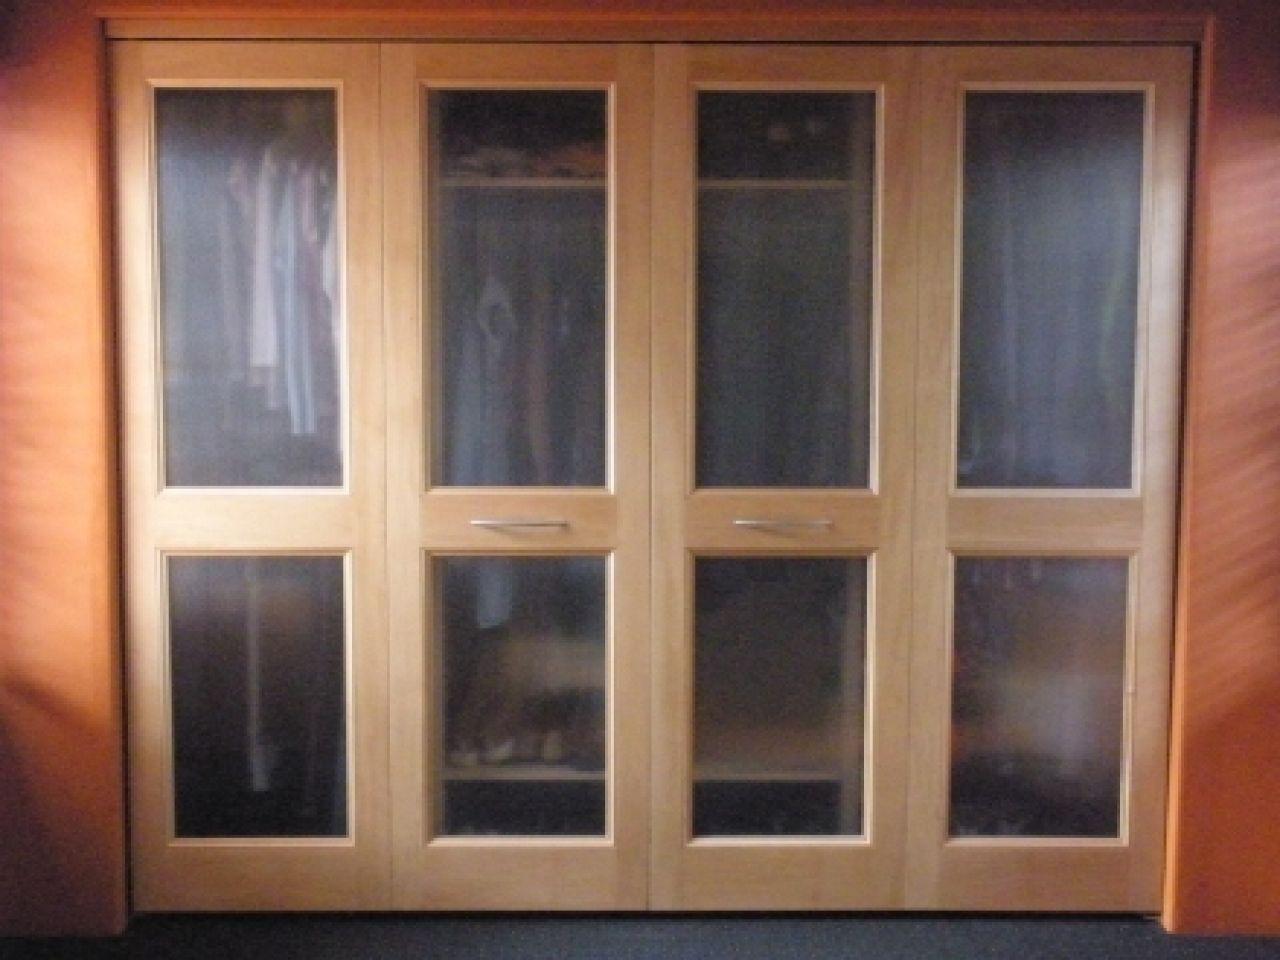 Bifold Closet Doors With Glass Inserts Installing Bifold Closet